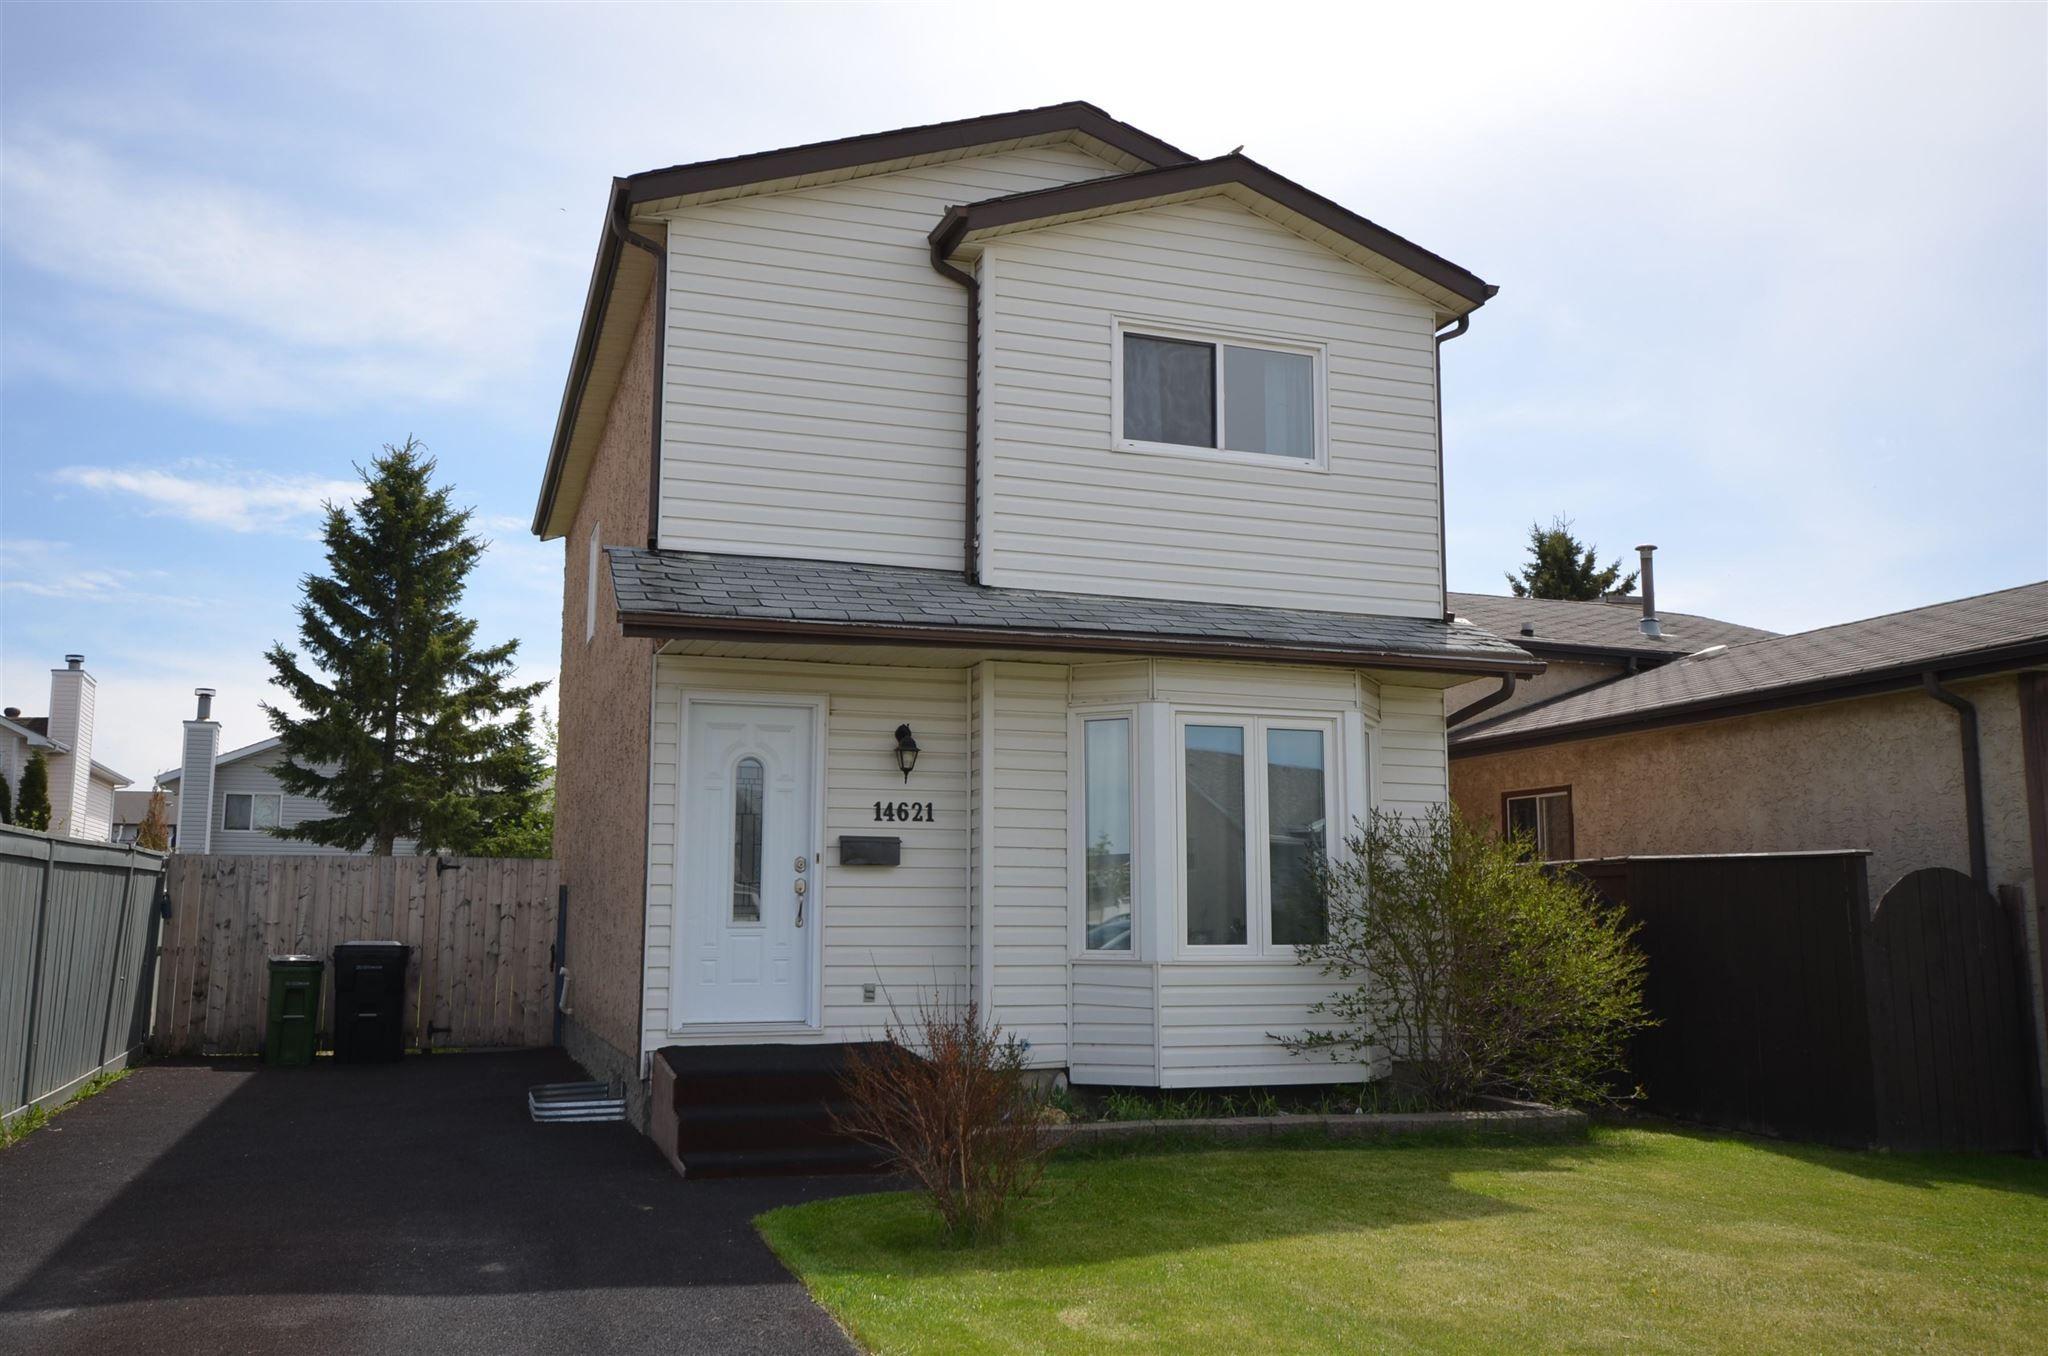 14621 37 St Edmonton 3+1 Bed Nice Yard Family House For Sale E4245117